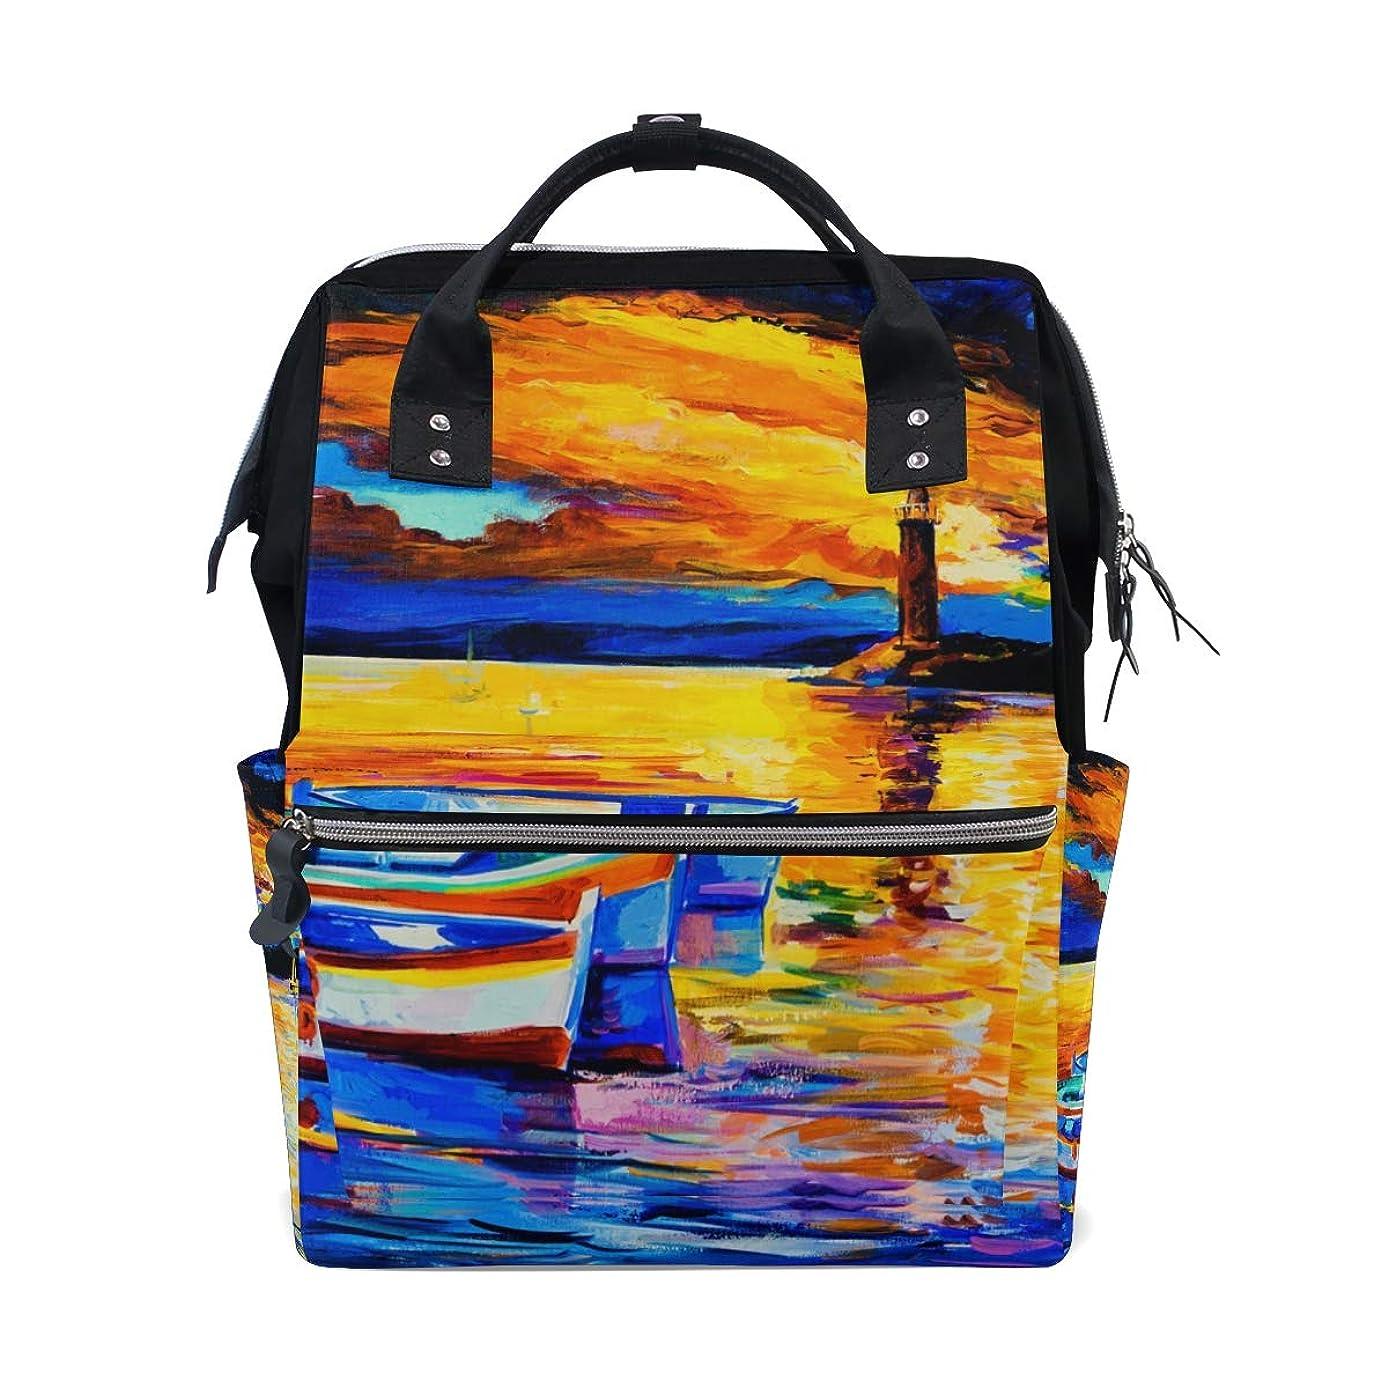 Oil Painting Boat Lighthouse River School Backpack Large Capacity Mummy Bags Laptop Handbag Casual Travel Rucksack Satchel For Women Men Adult Teen Children